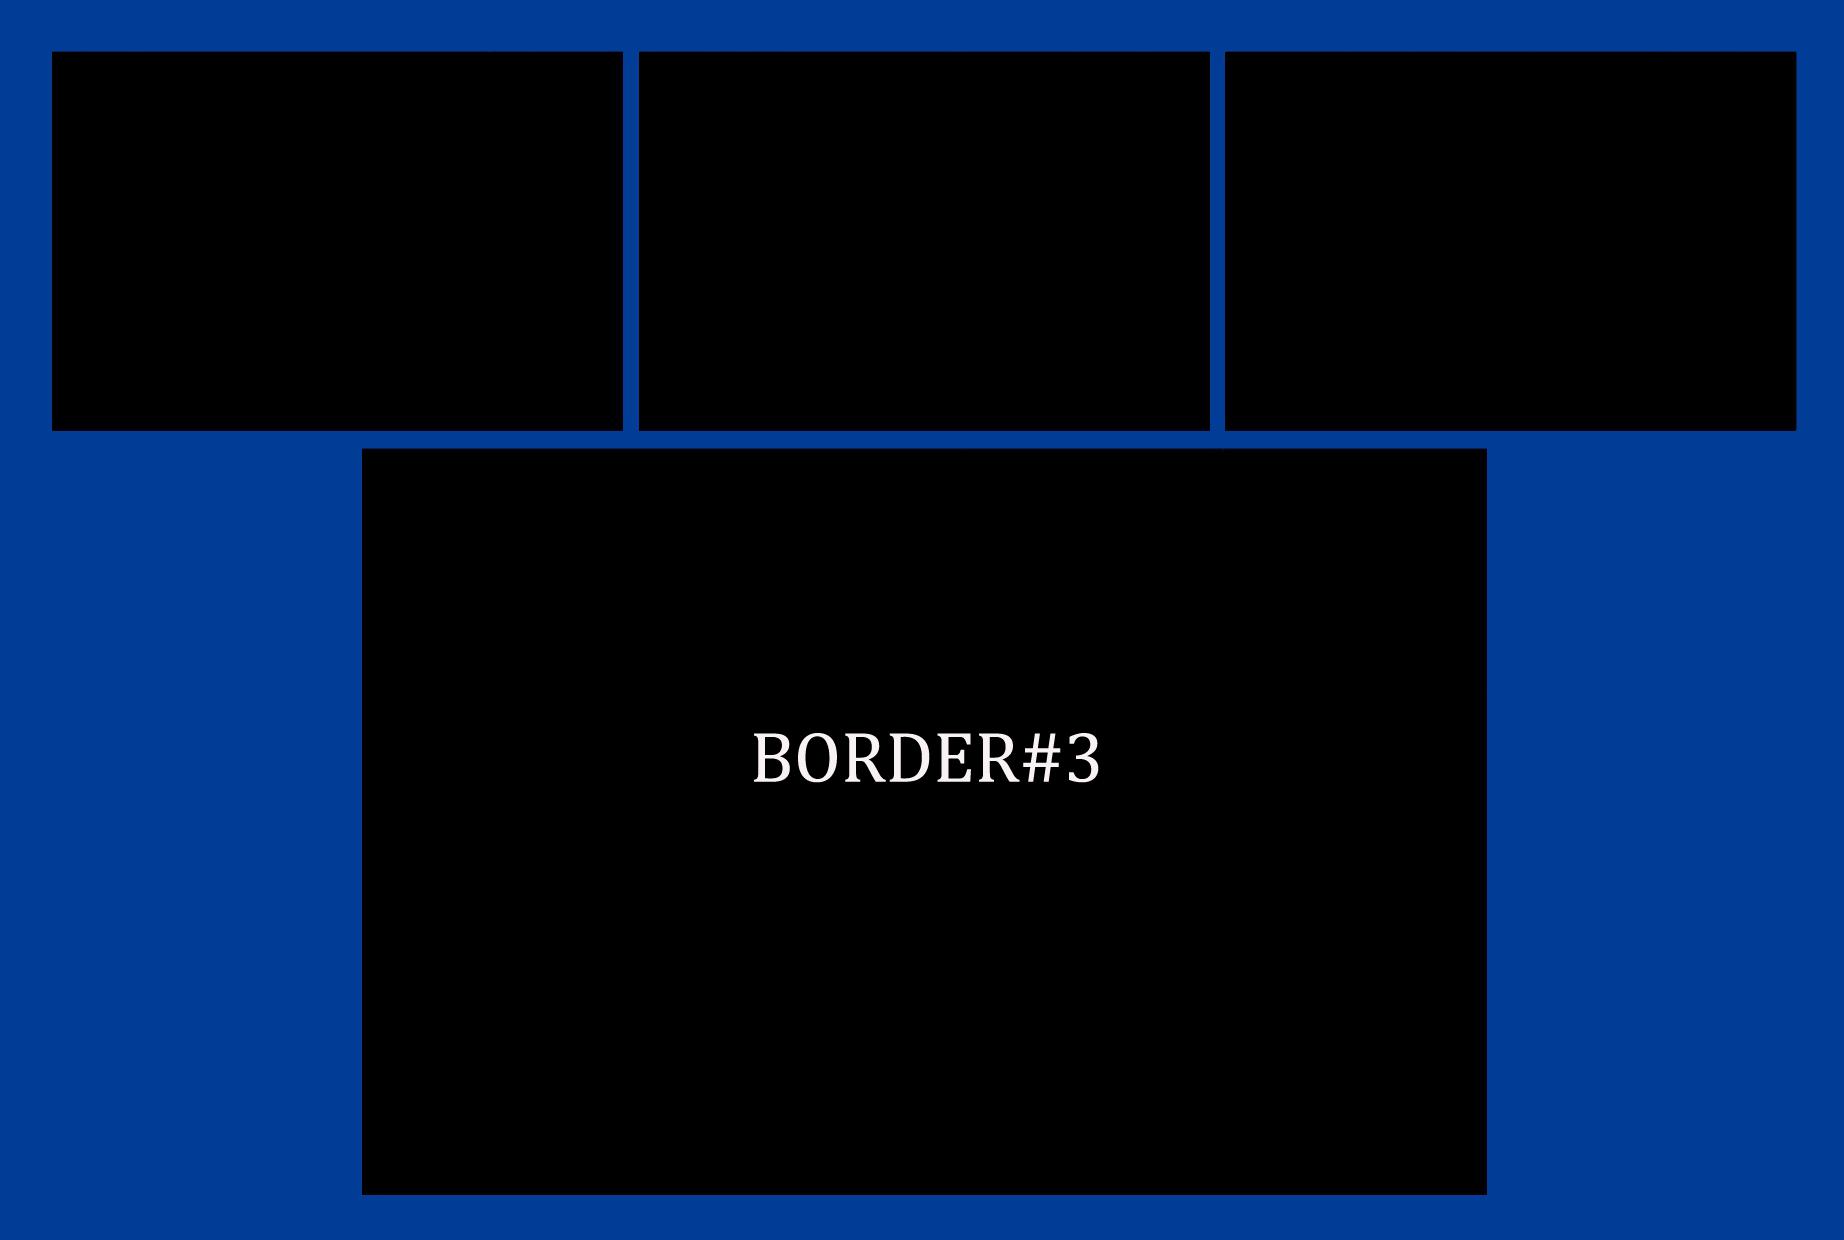 BORDER#3